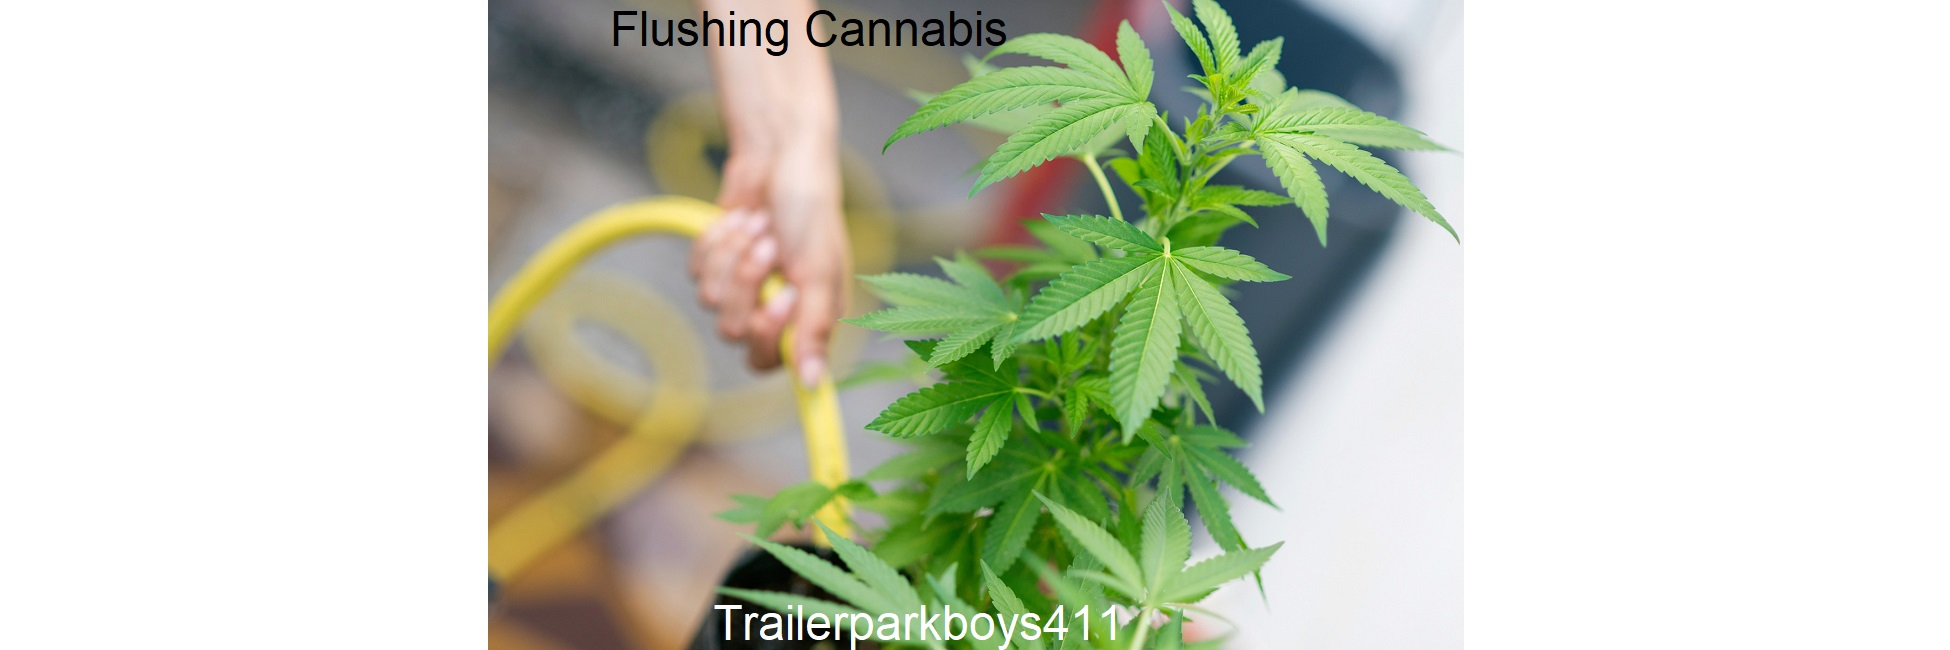 How To Flush Cannabis